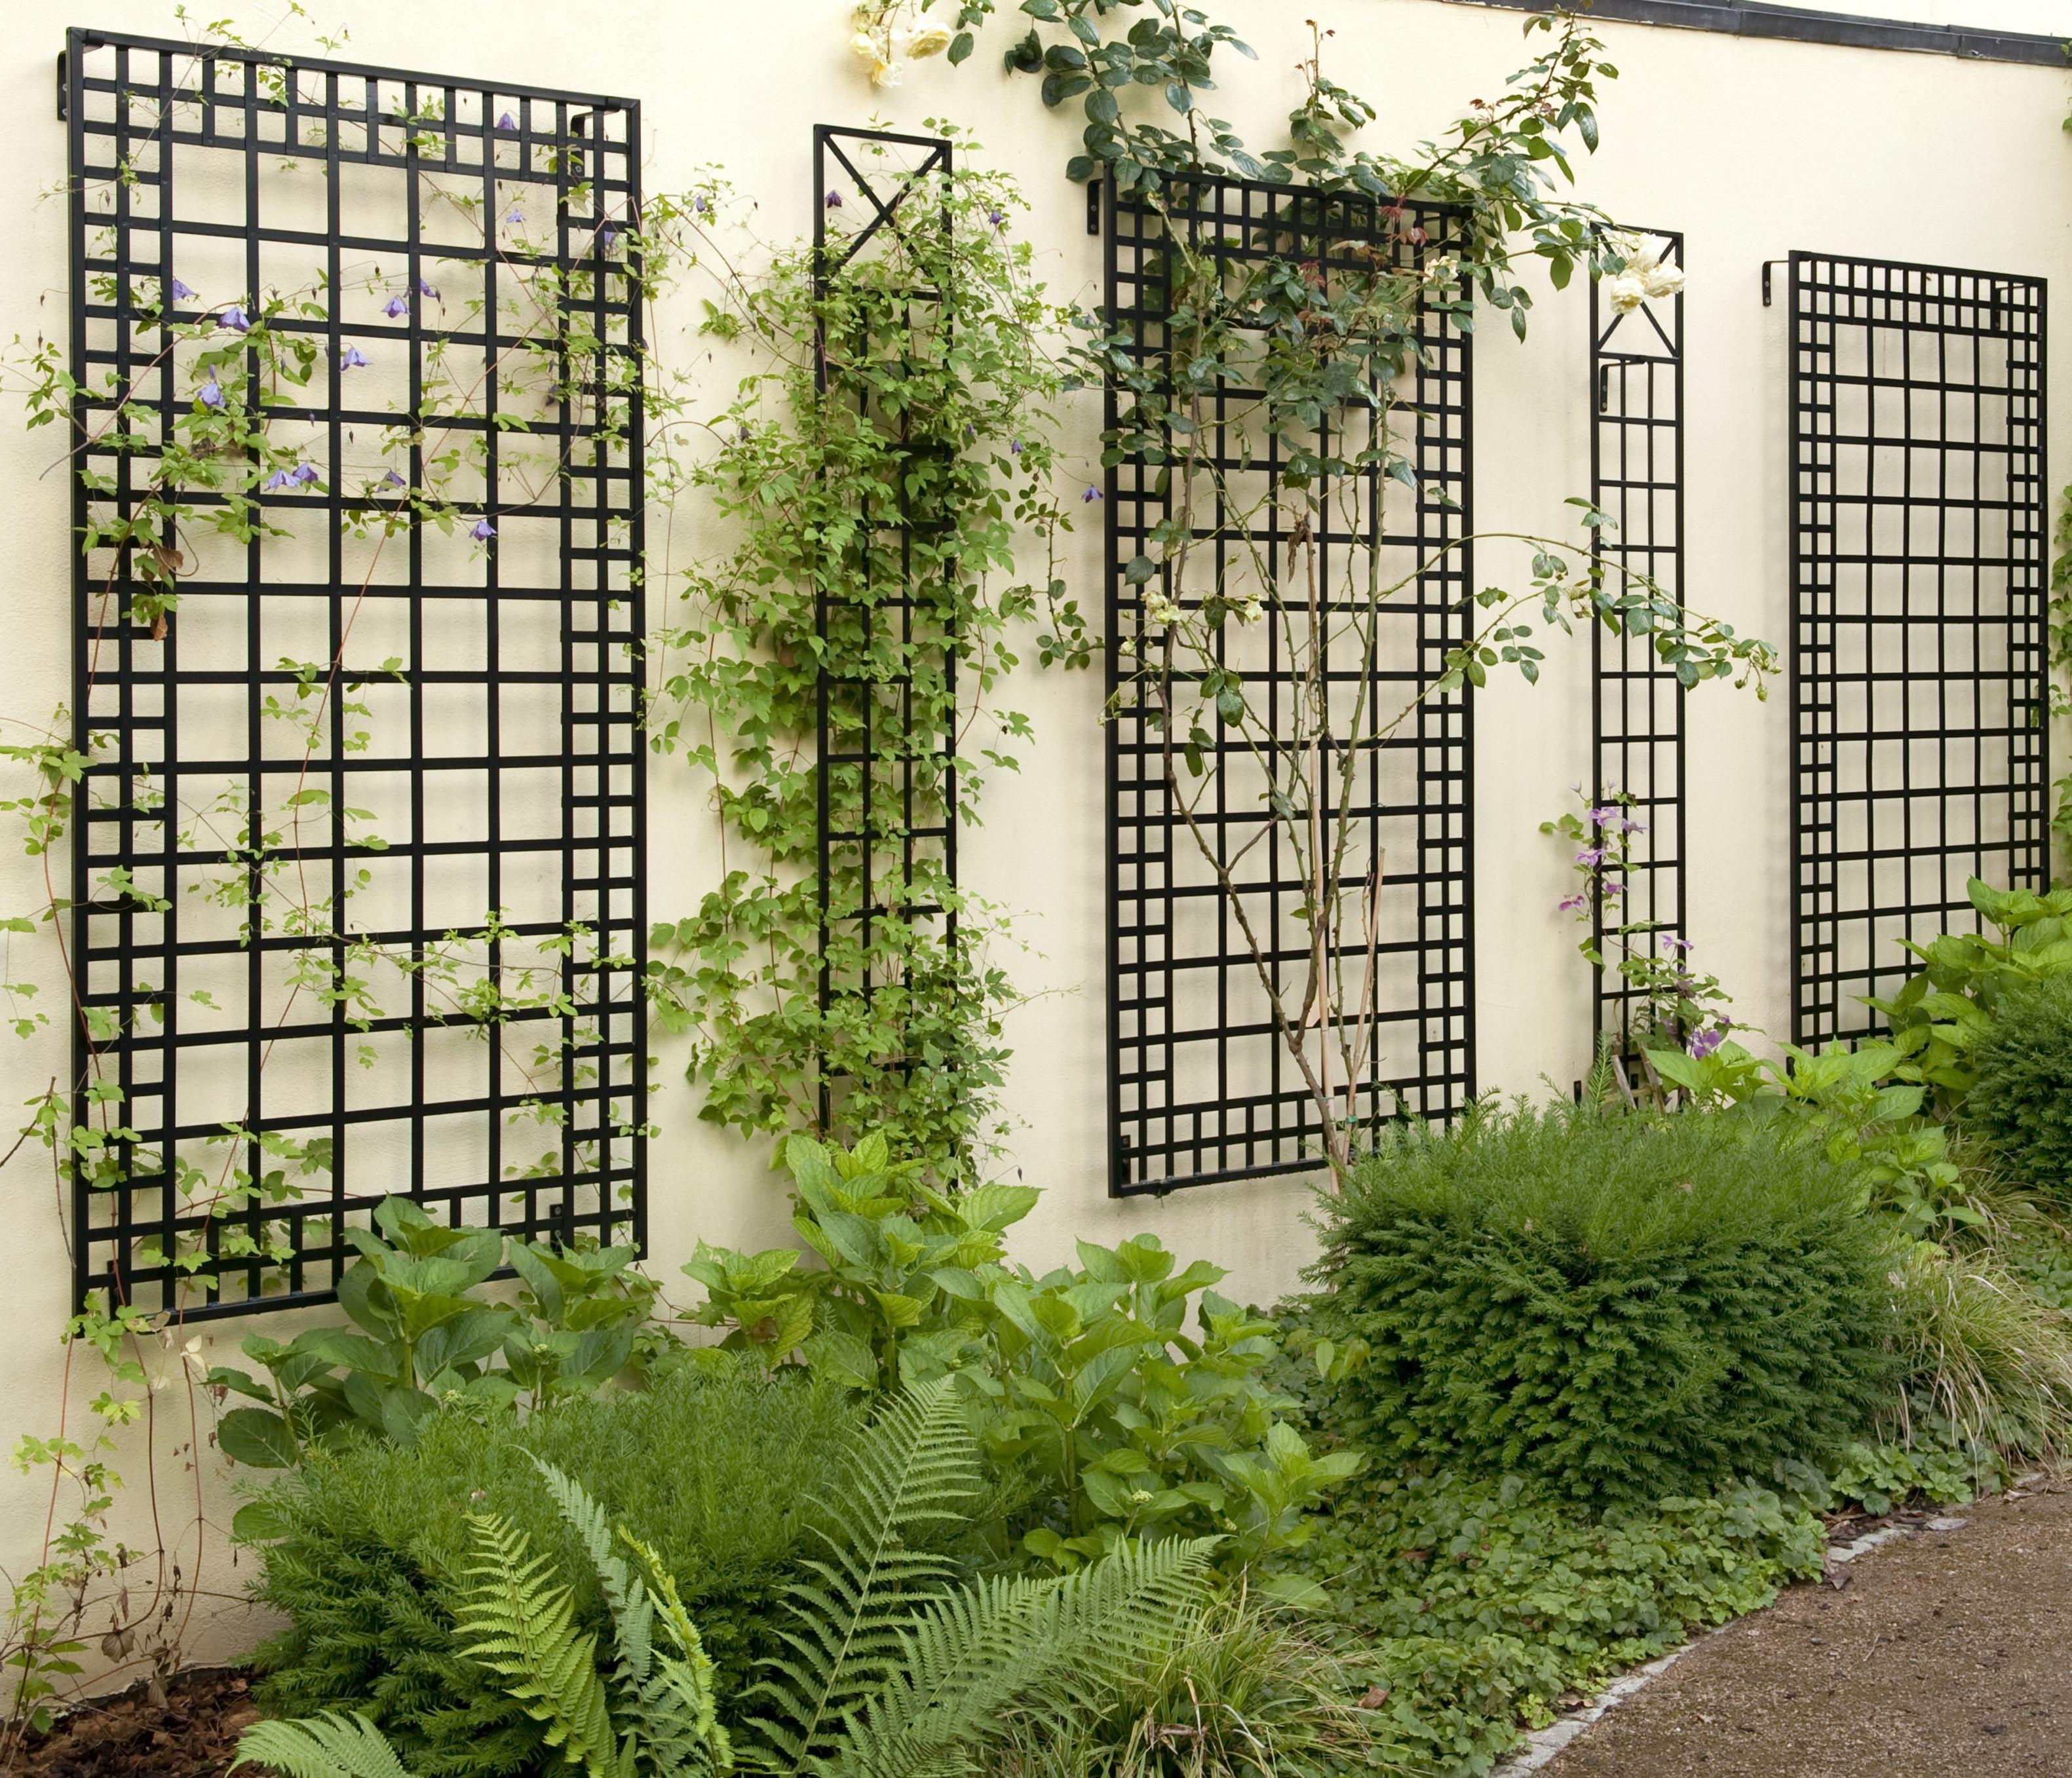 Exklusives Wandspalier Aus Metall 200 X 100 Cm Kann Eine Fassadenbegrunung Schoner Sein Spalier Rankgitter Fassadenbegrunung